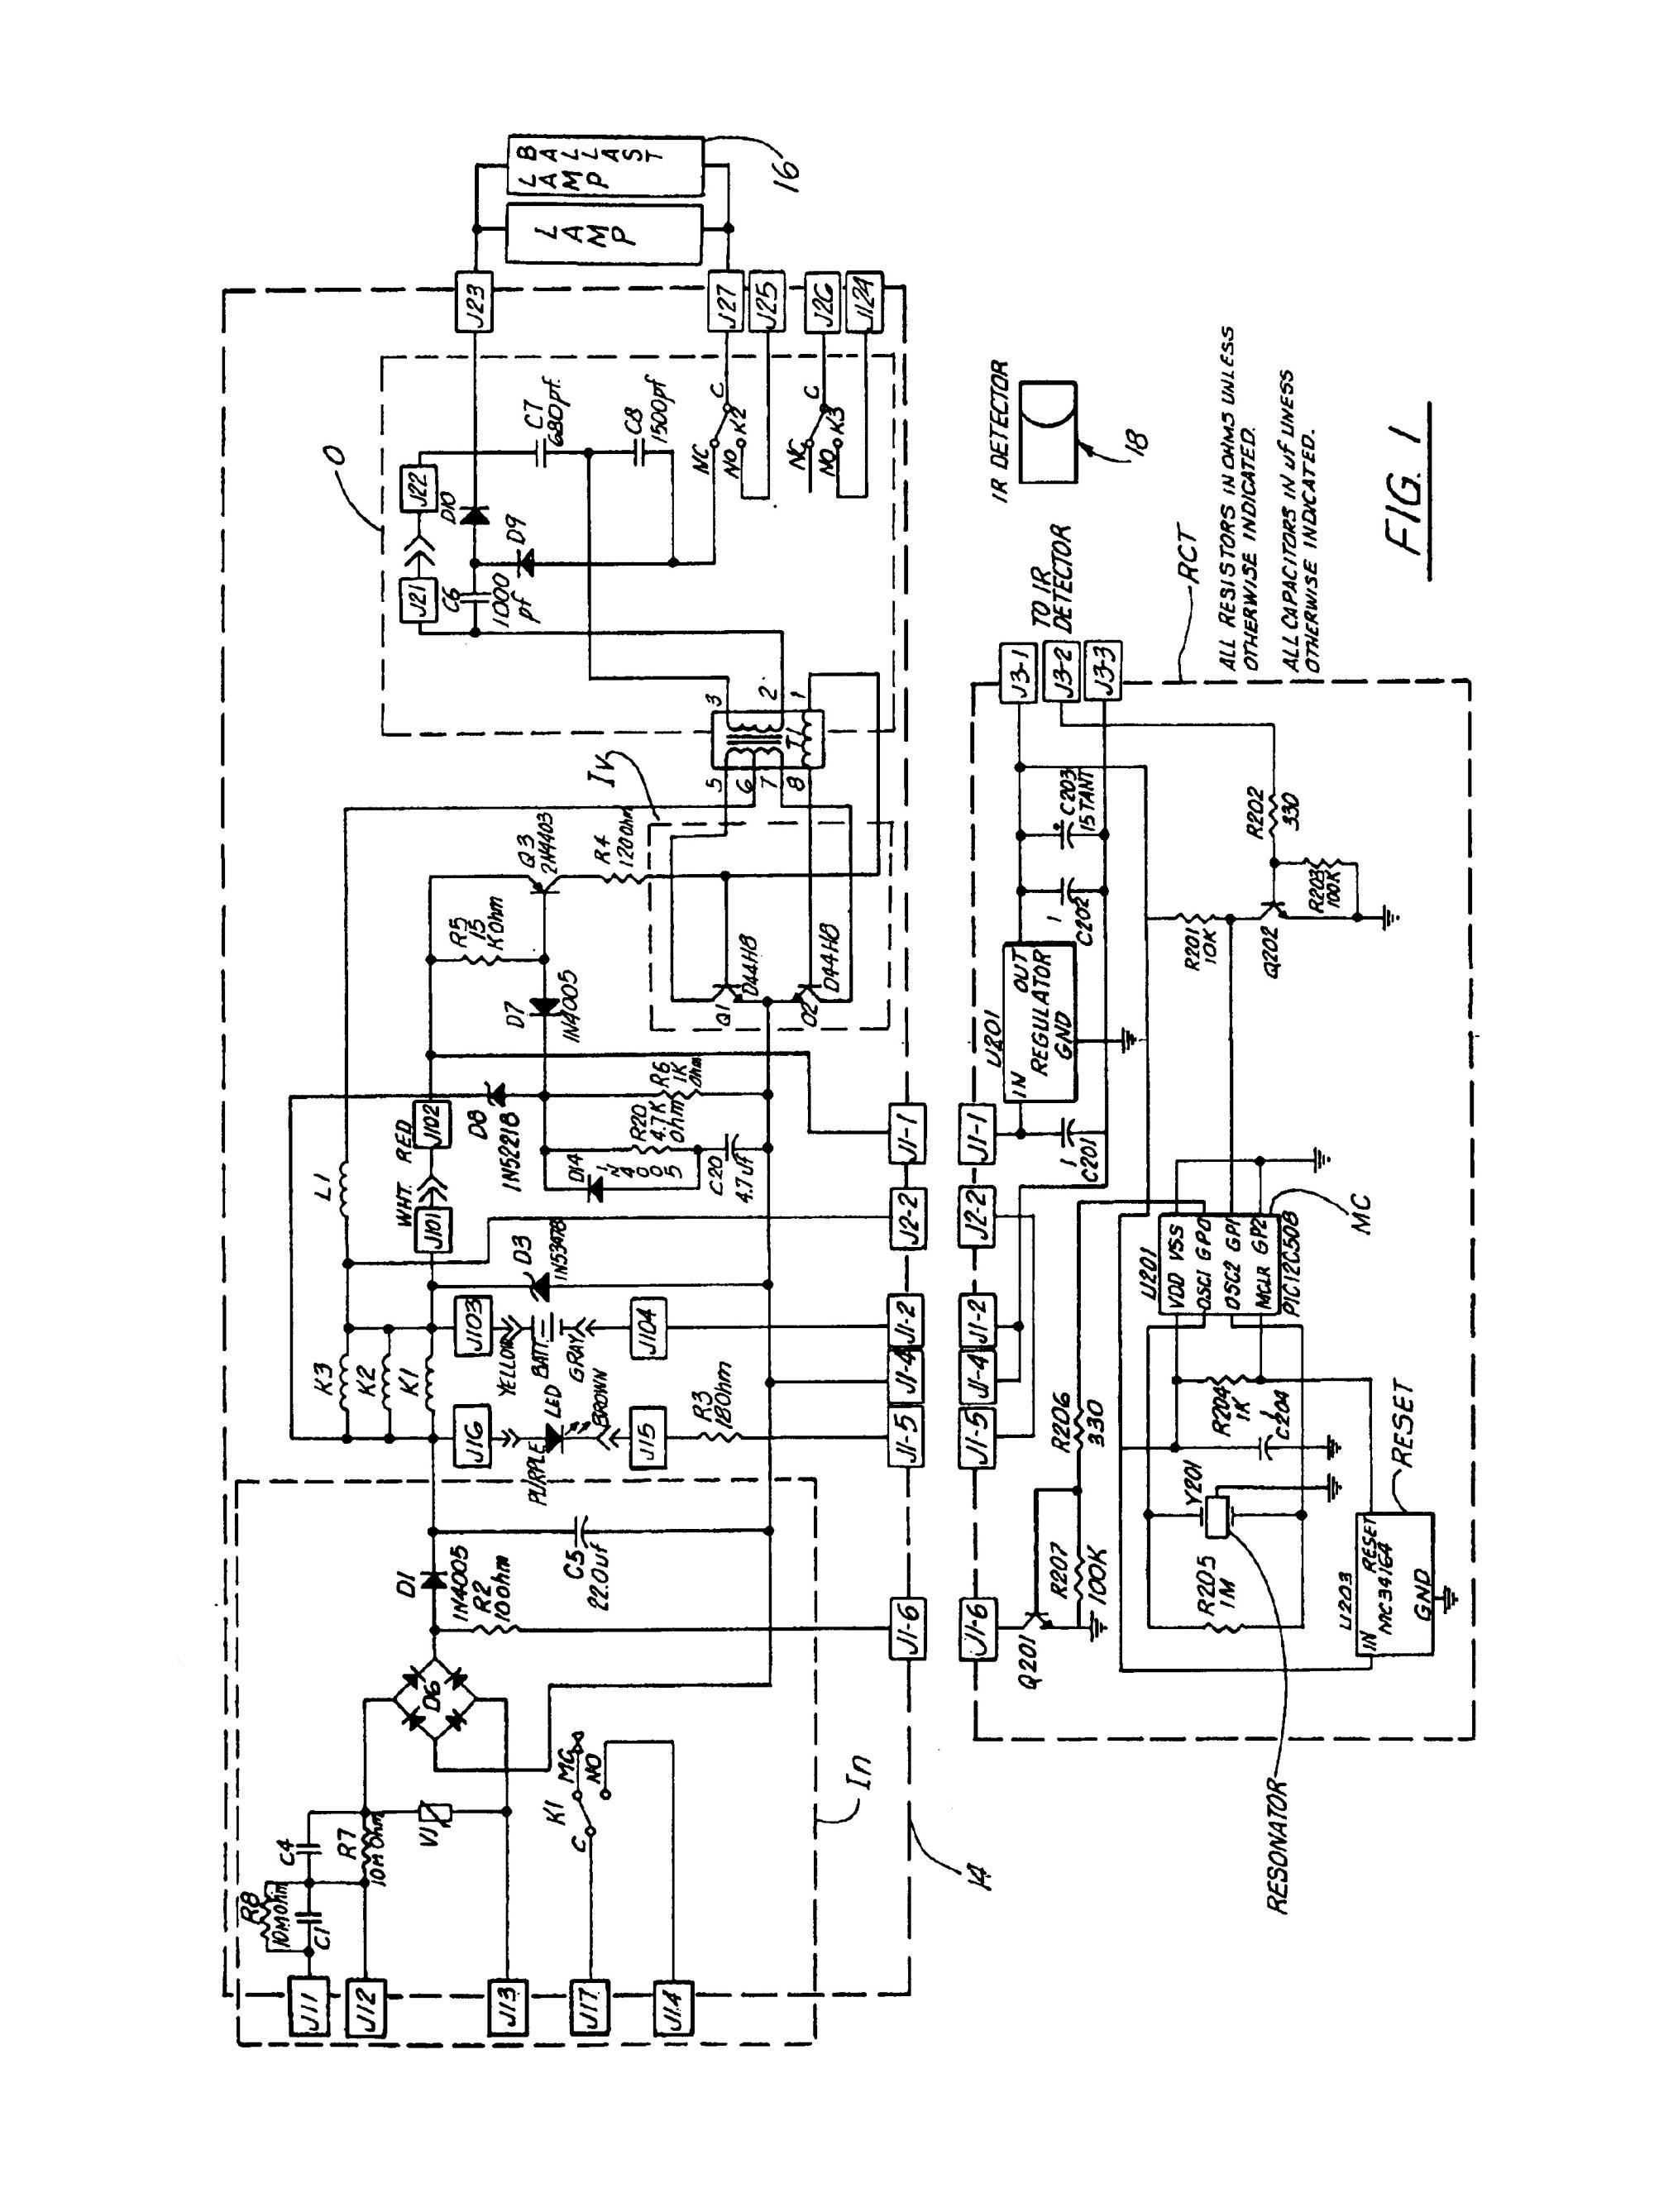 hight resolution of bodine emergency ballast wiring diagram bodine b100 fluorescent emergency ballast wiring diagram wiring of bodine emergency